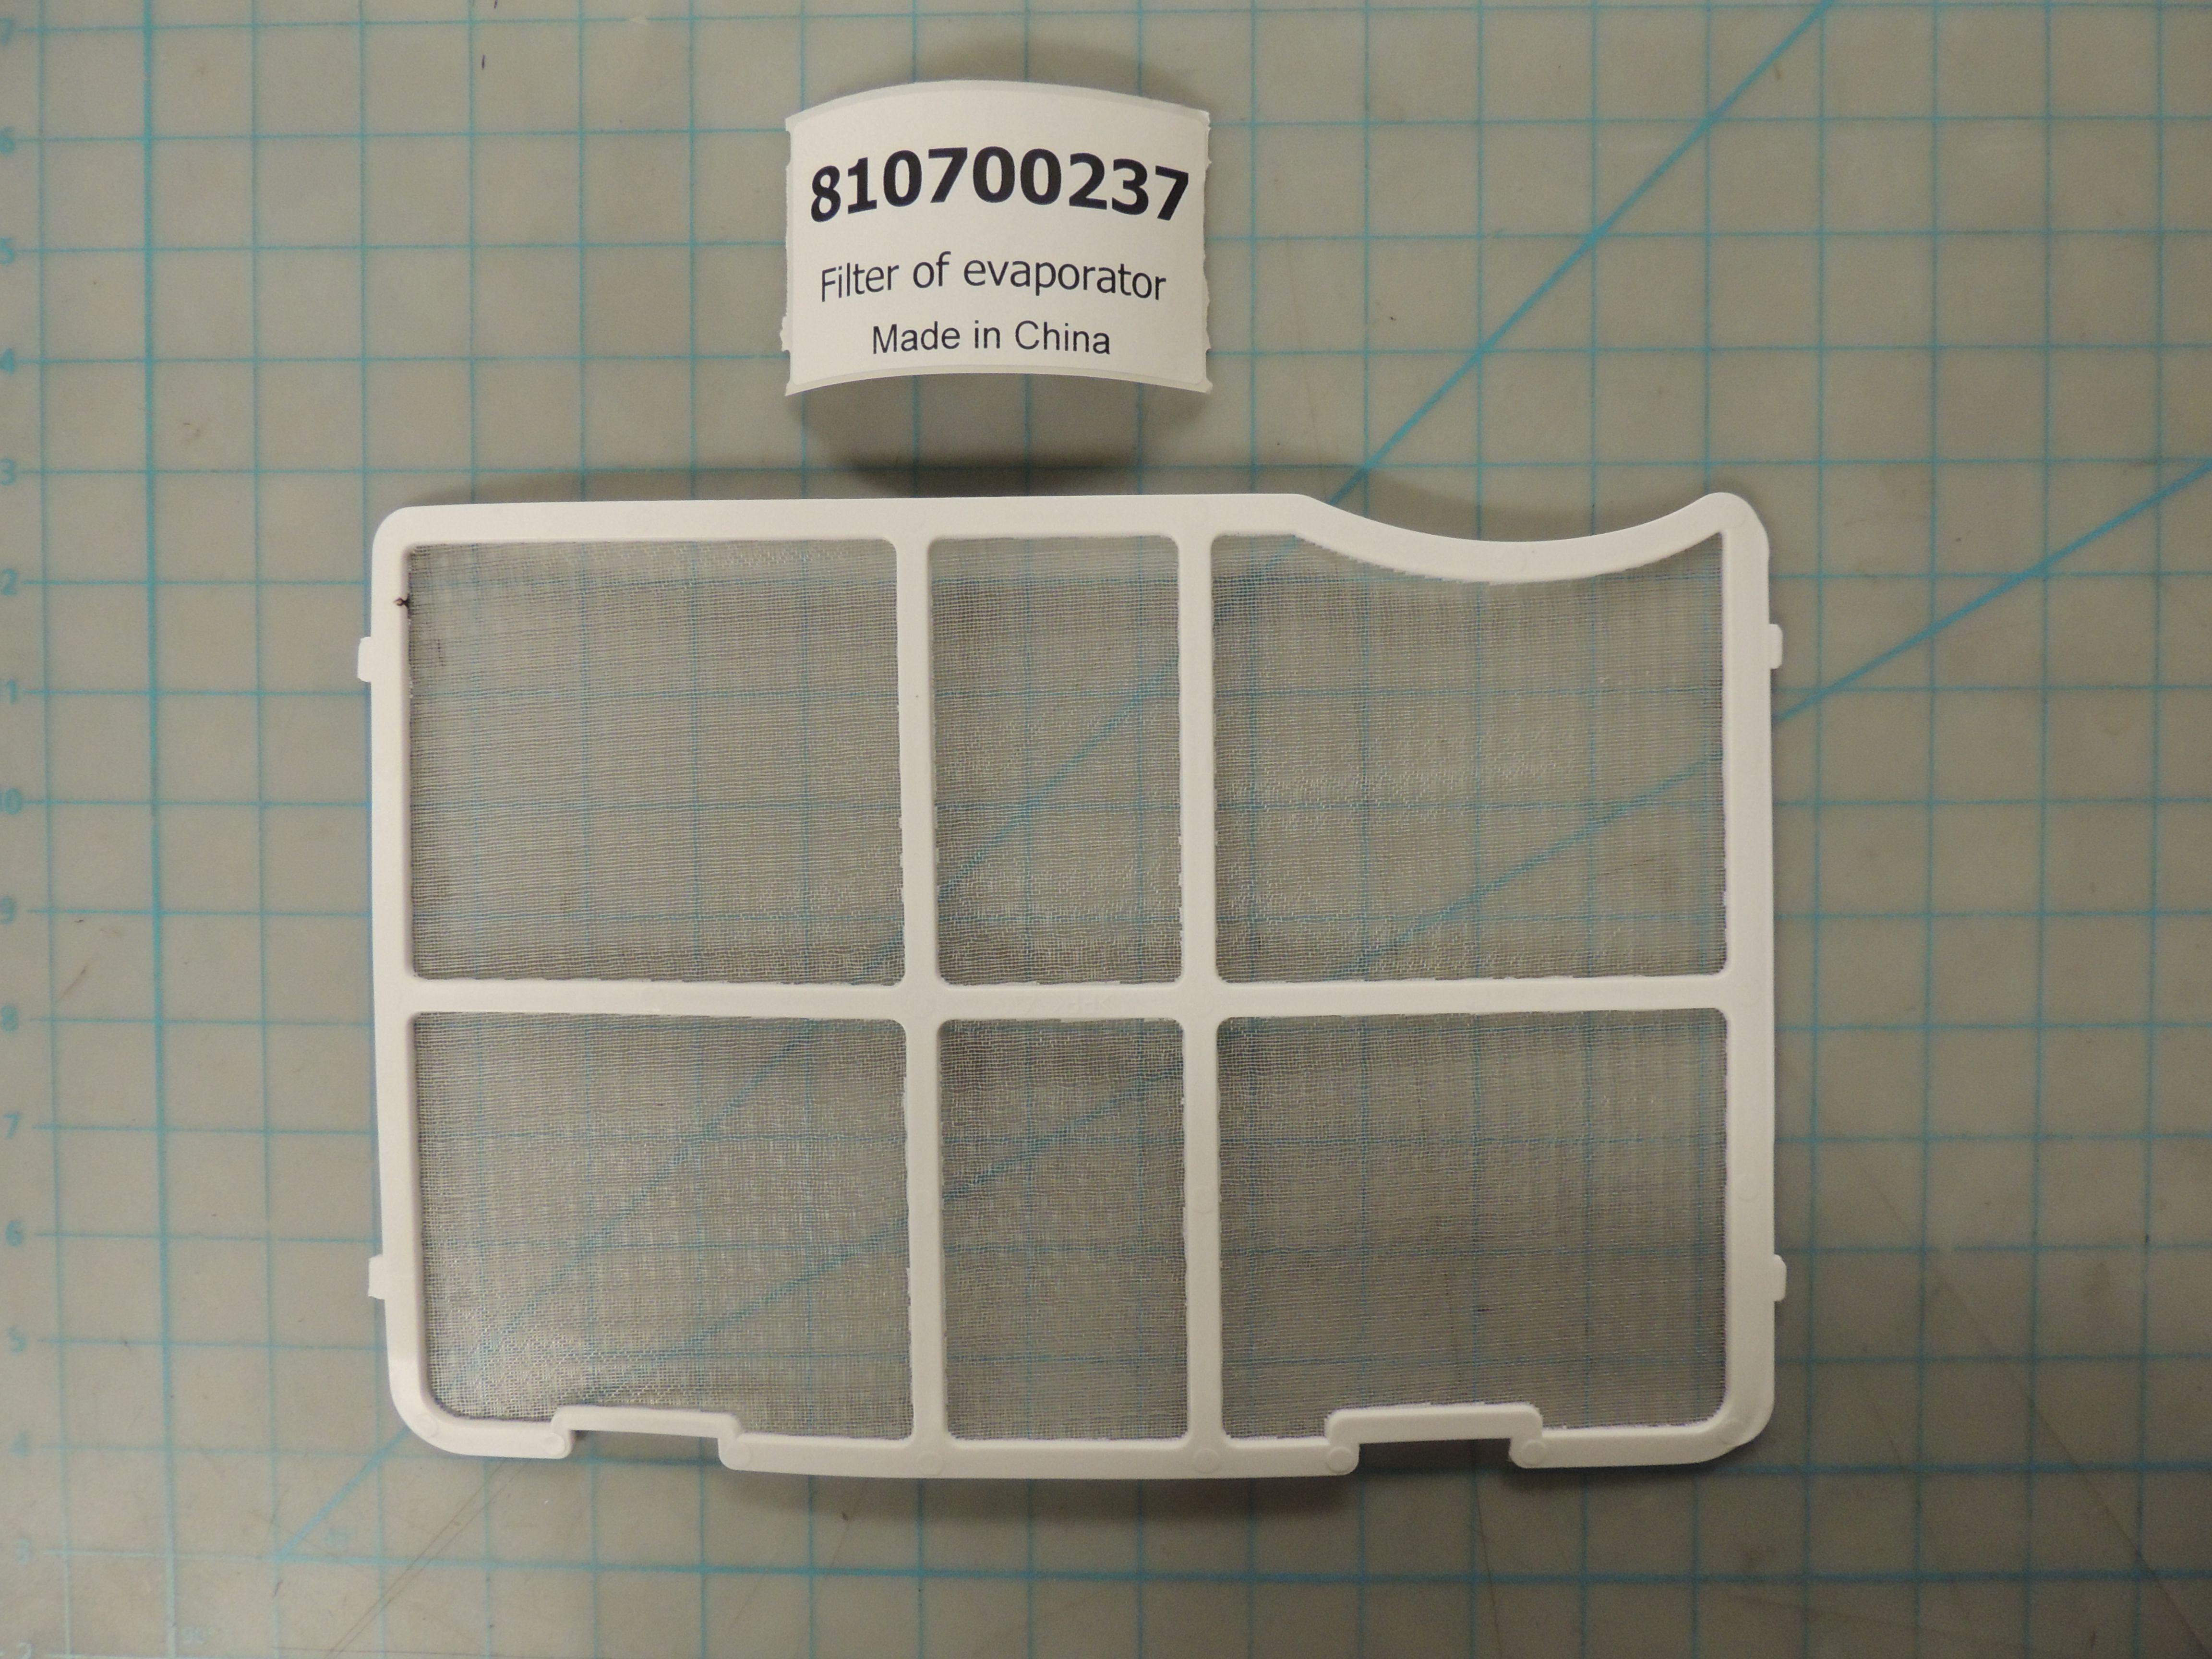 Filter of evaporator